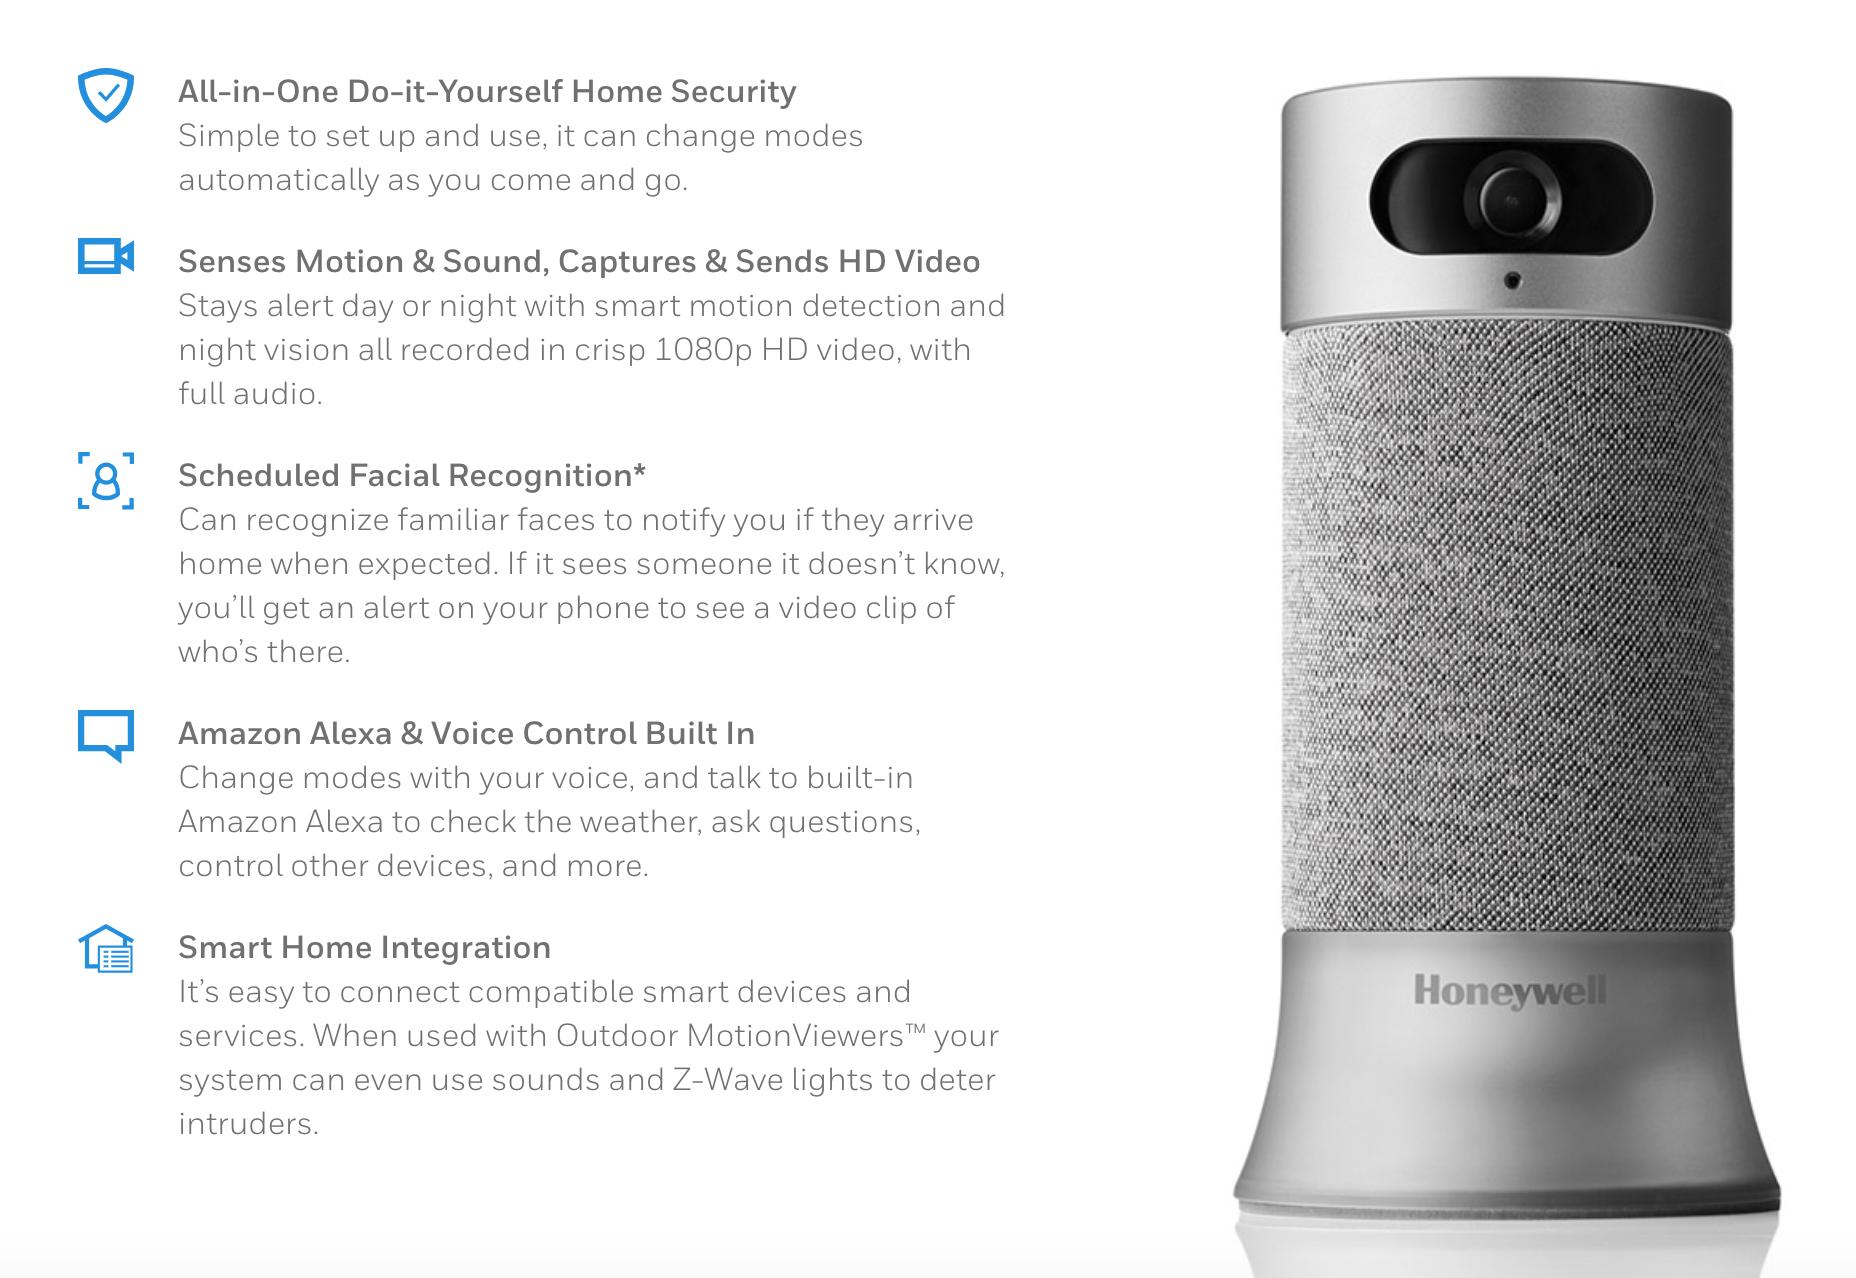 honeywell smart home security